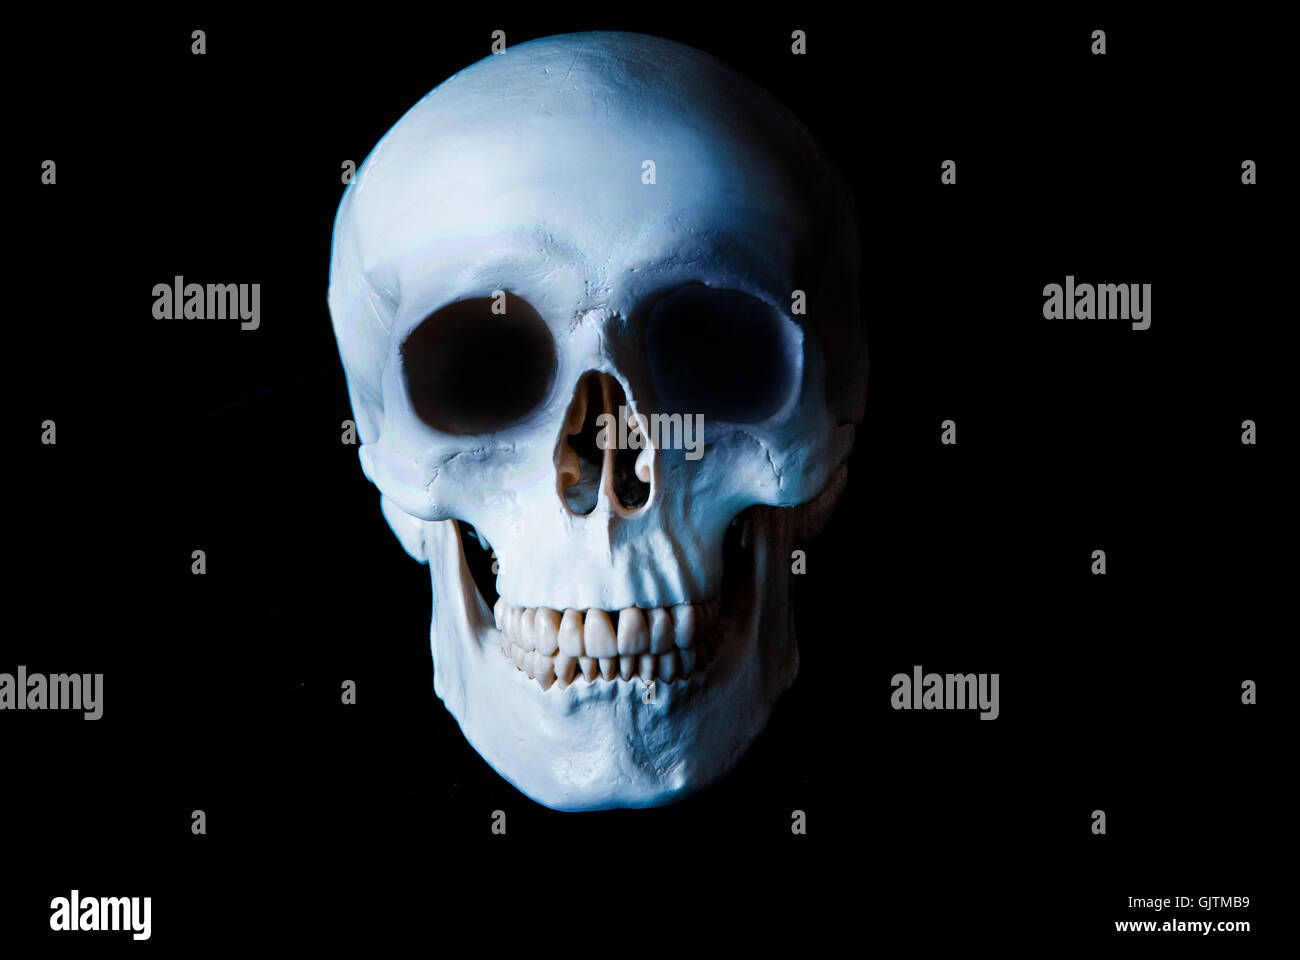 human skull - Stock Image